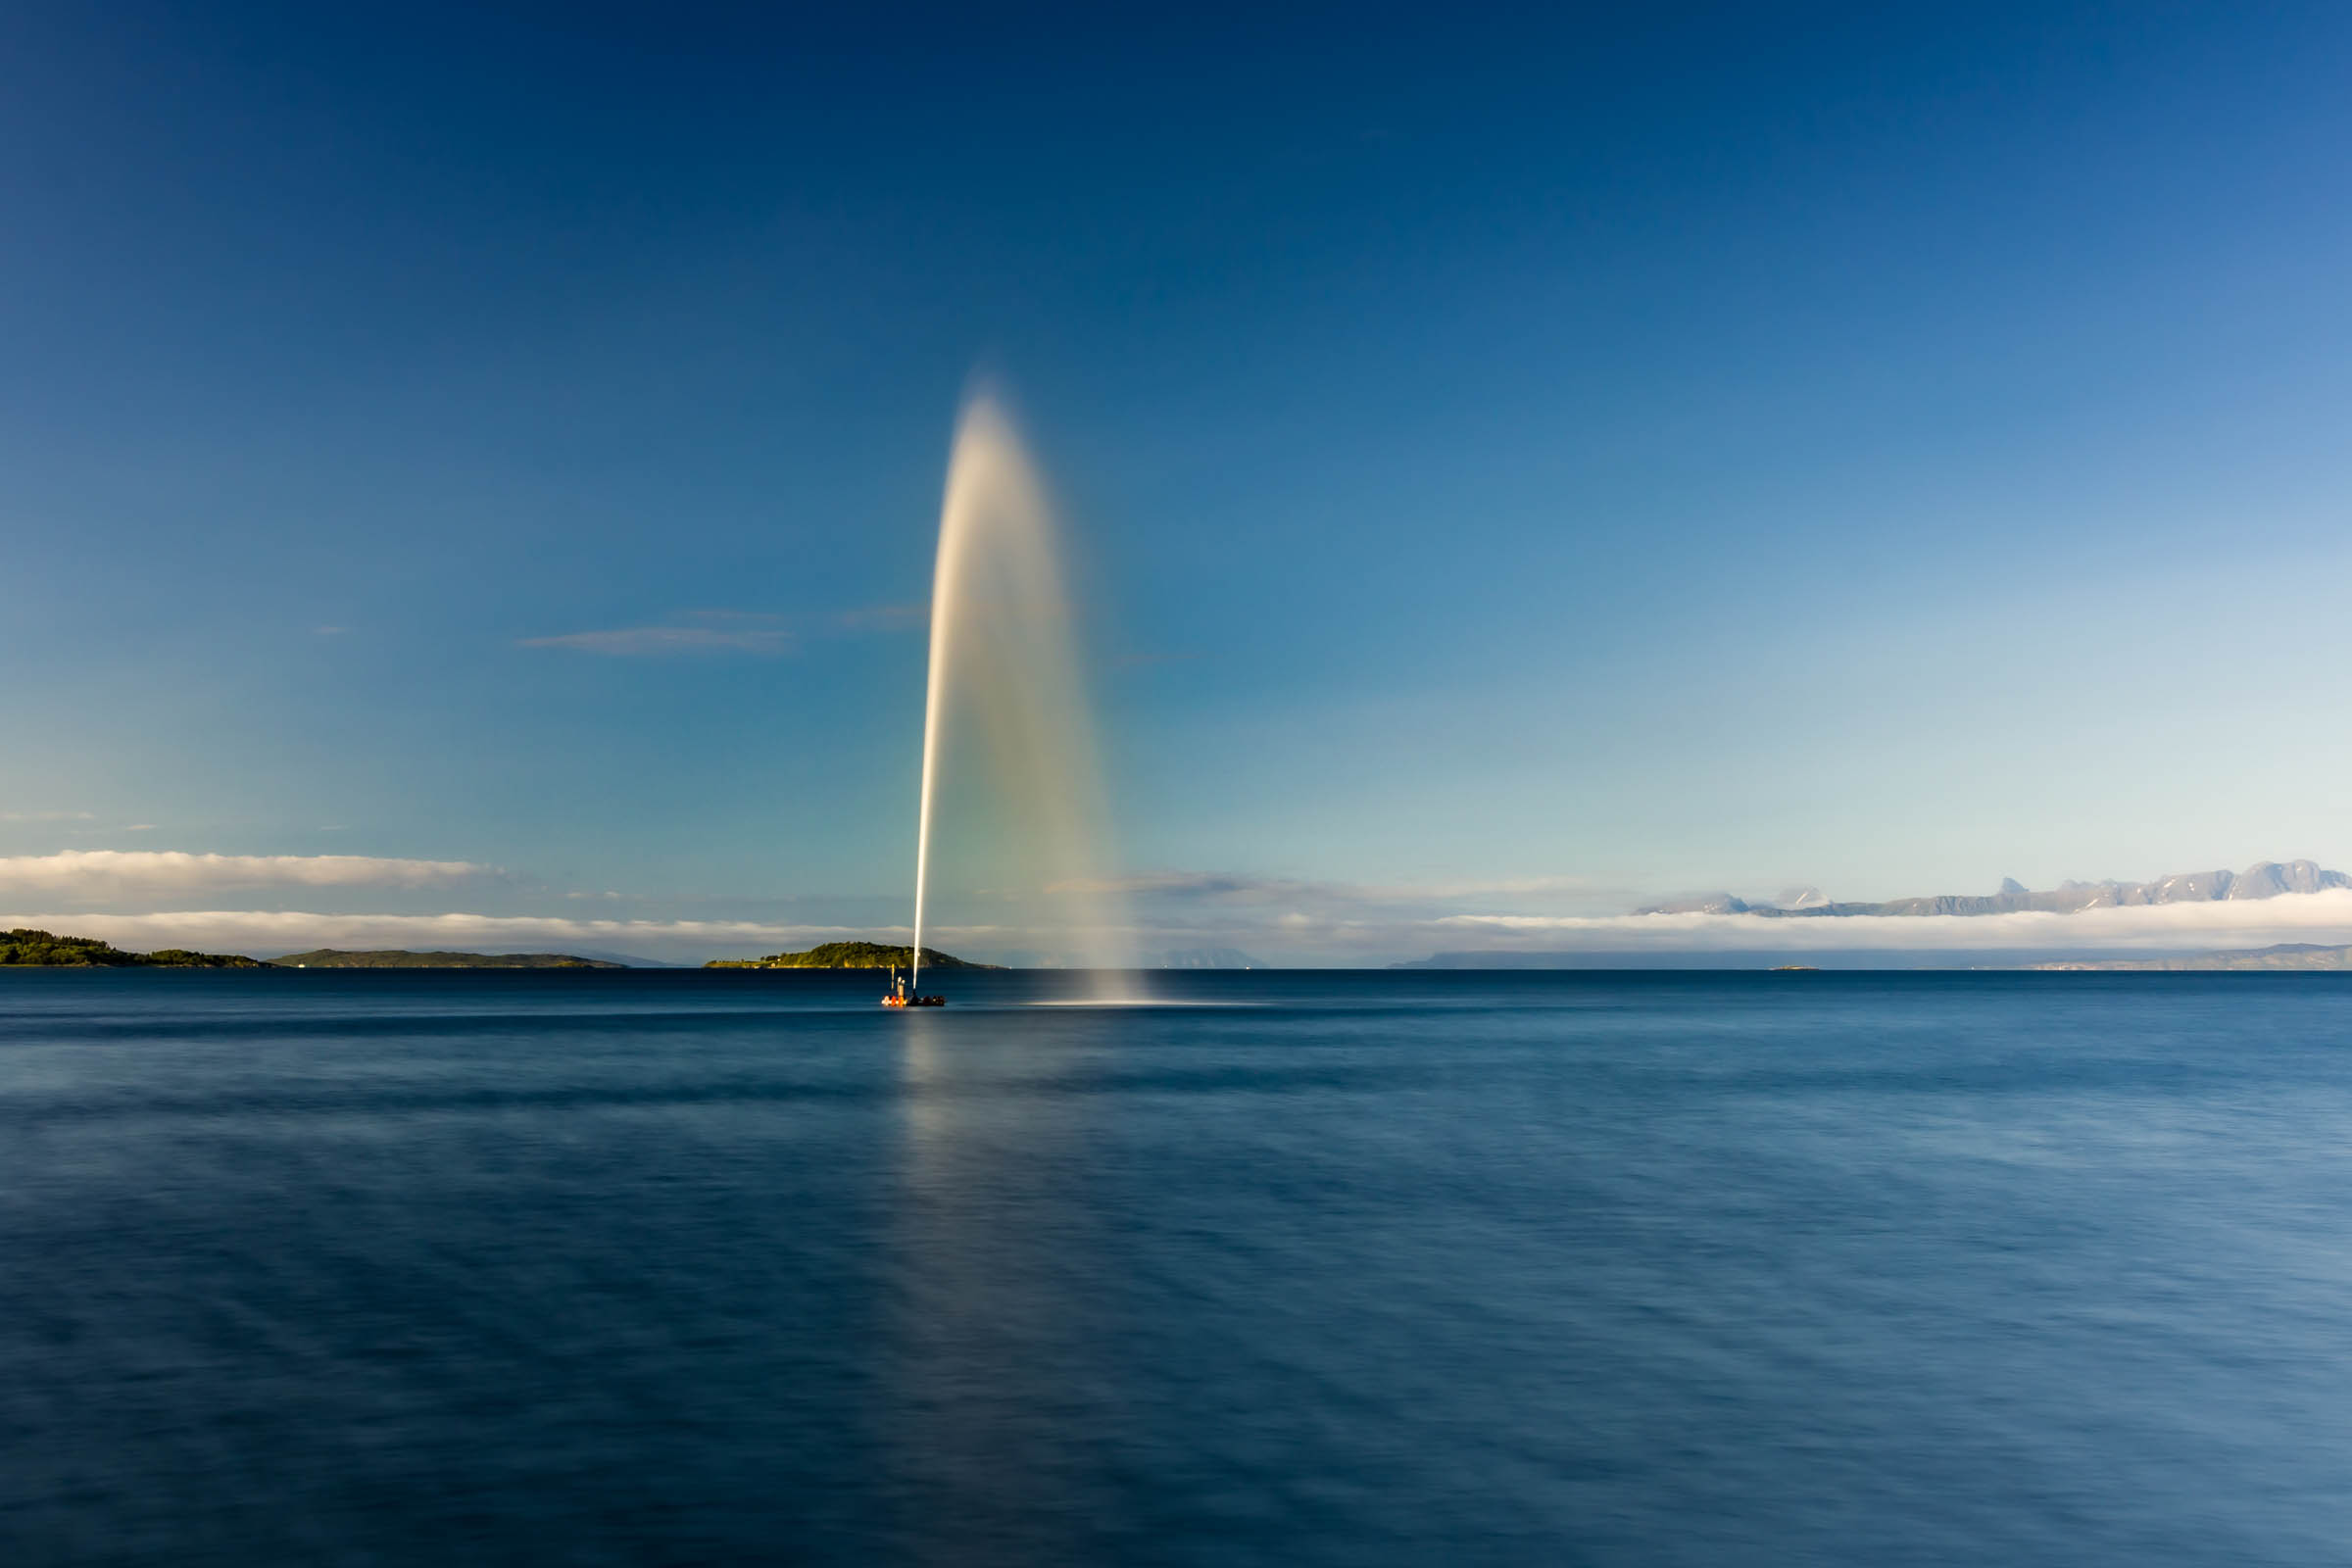 Long exposure - Selsbanes seil - Copyright © Trygve Selmer